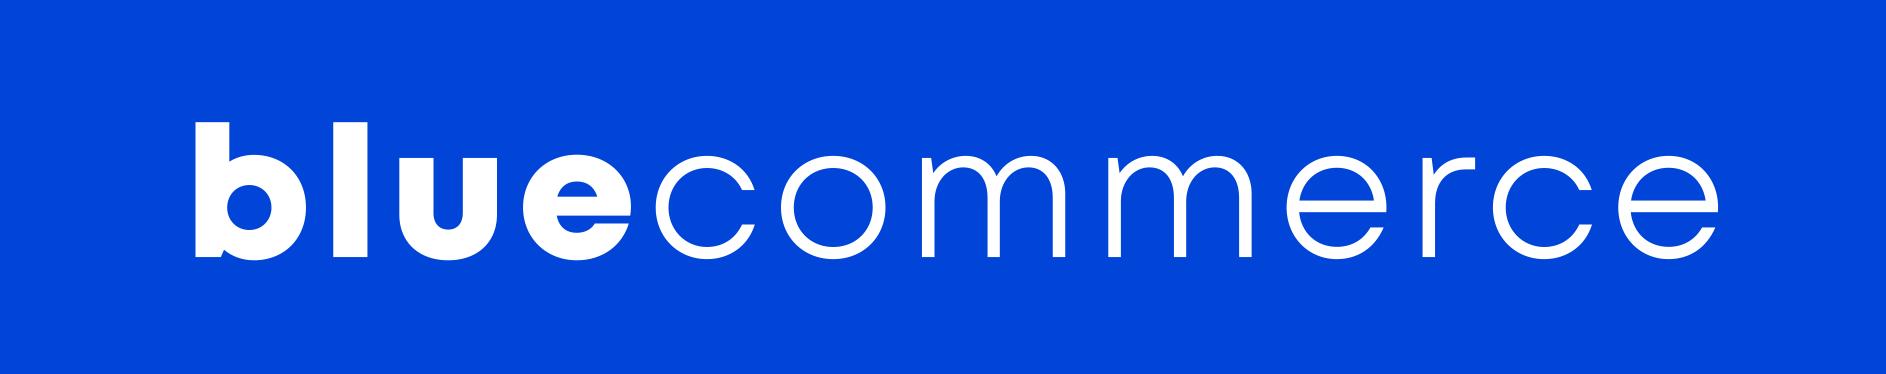 Logo Blue Commerce azul